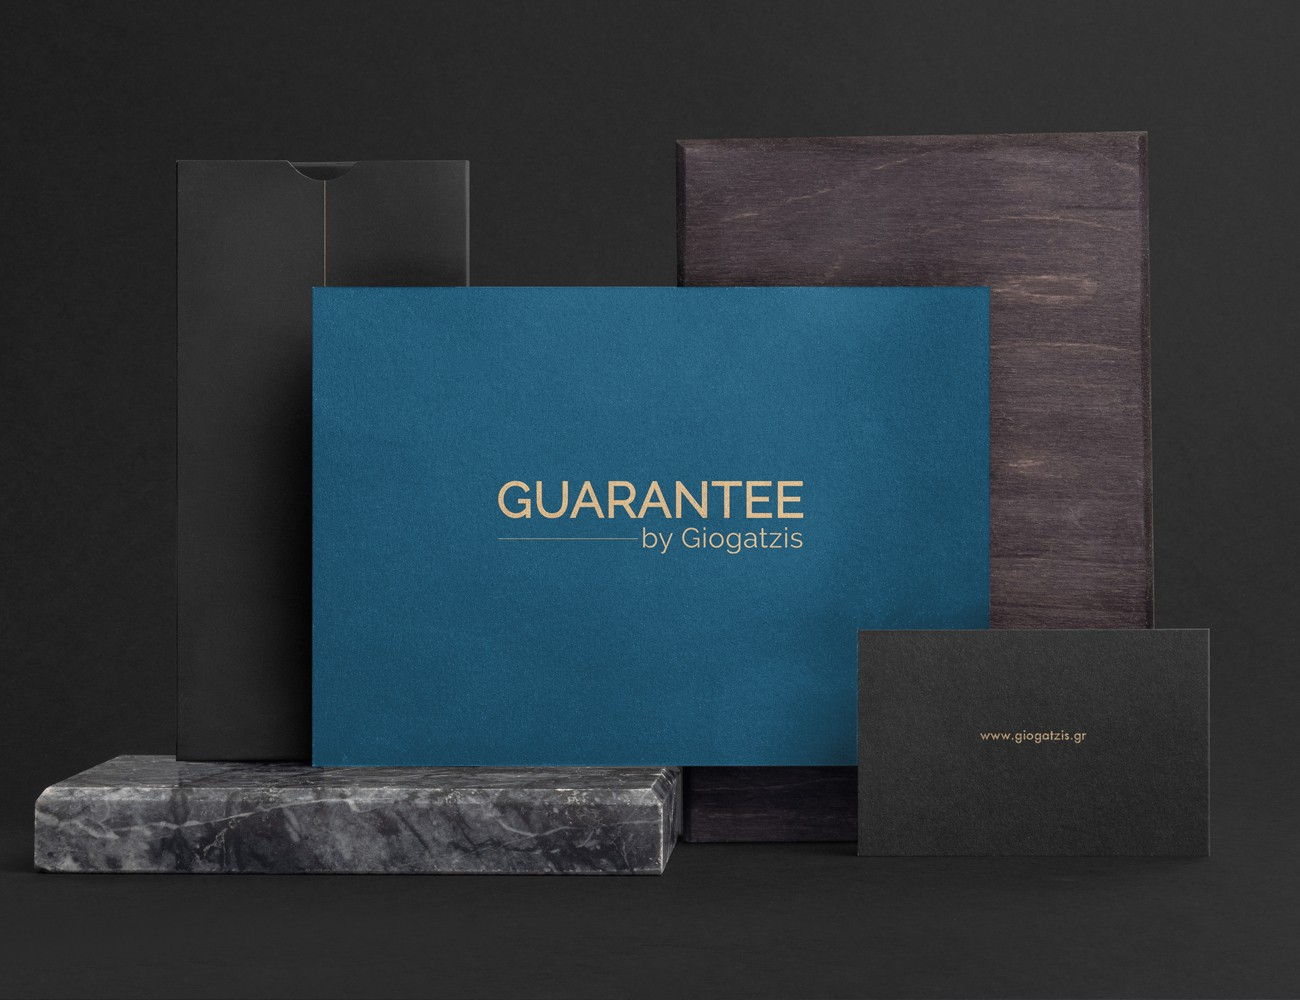 Guarantee by Giogatzis